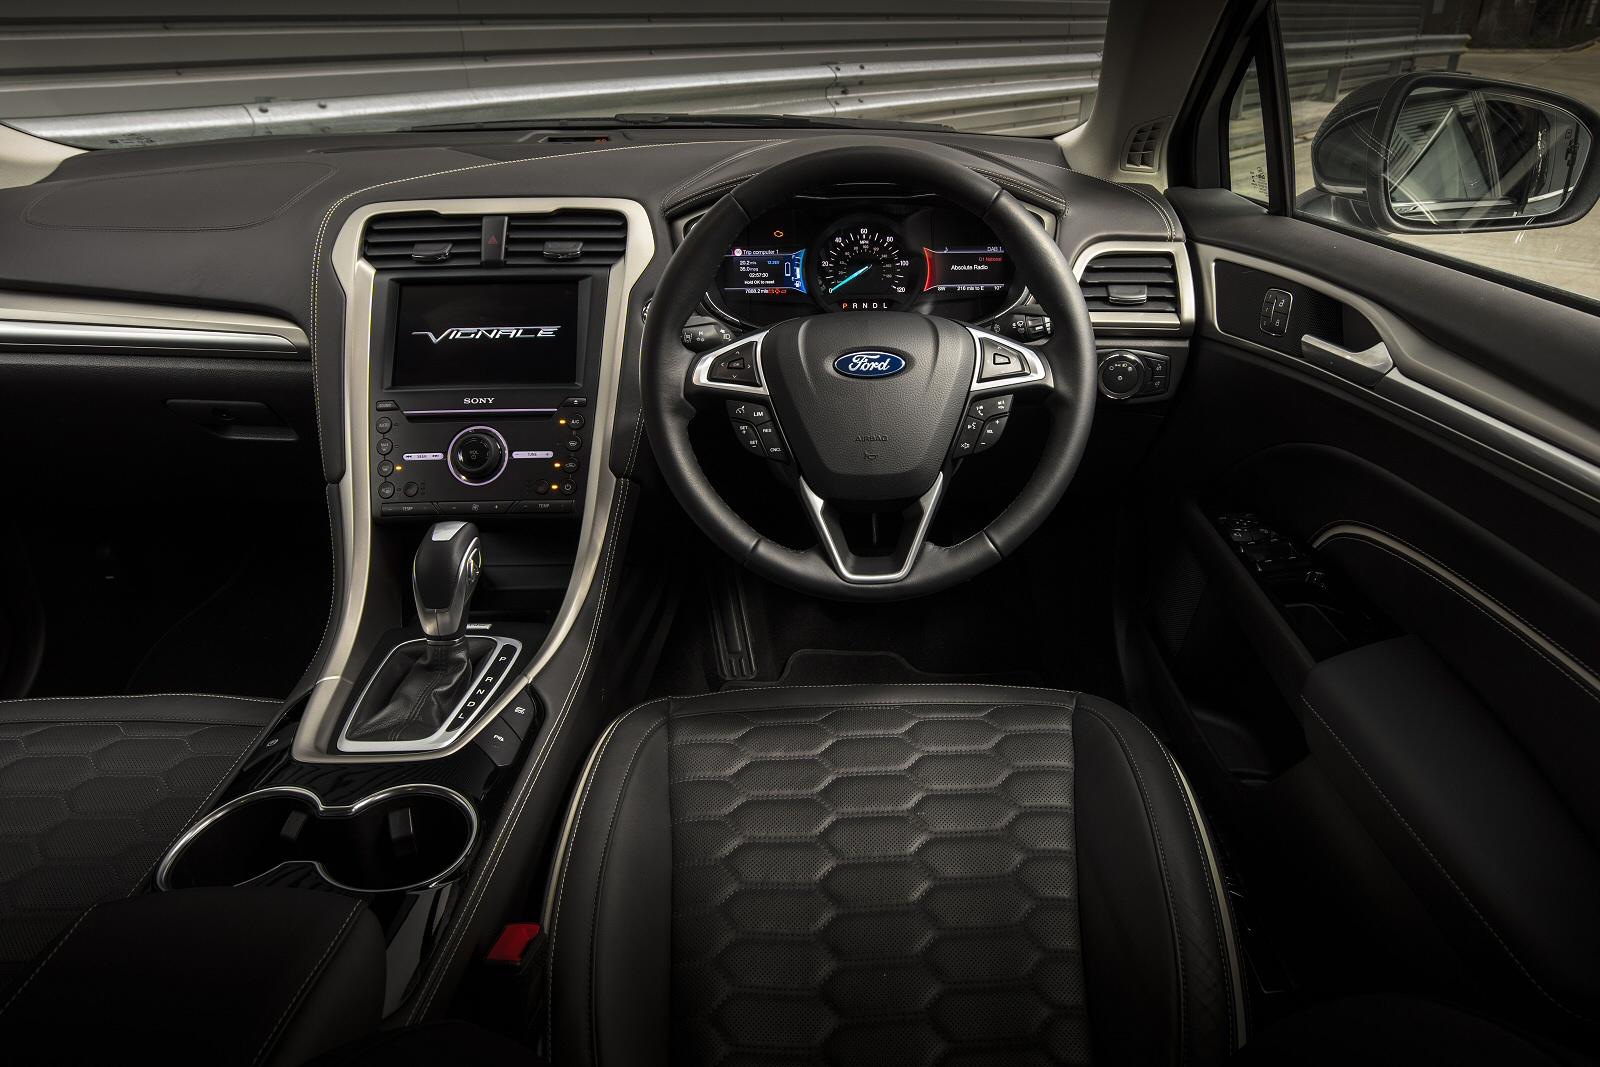 new ford mondeo vignale 2 0 hybrid 4dr auto hybrid saloon. Black Bedroom Furniture Sets. Home Design Ideas